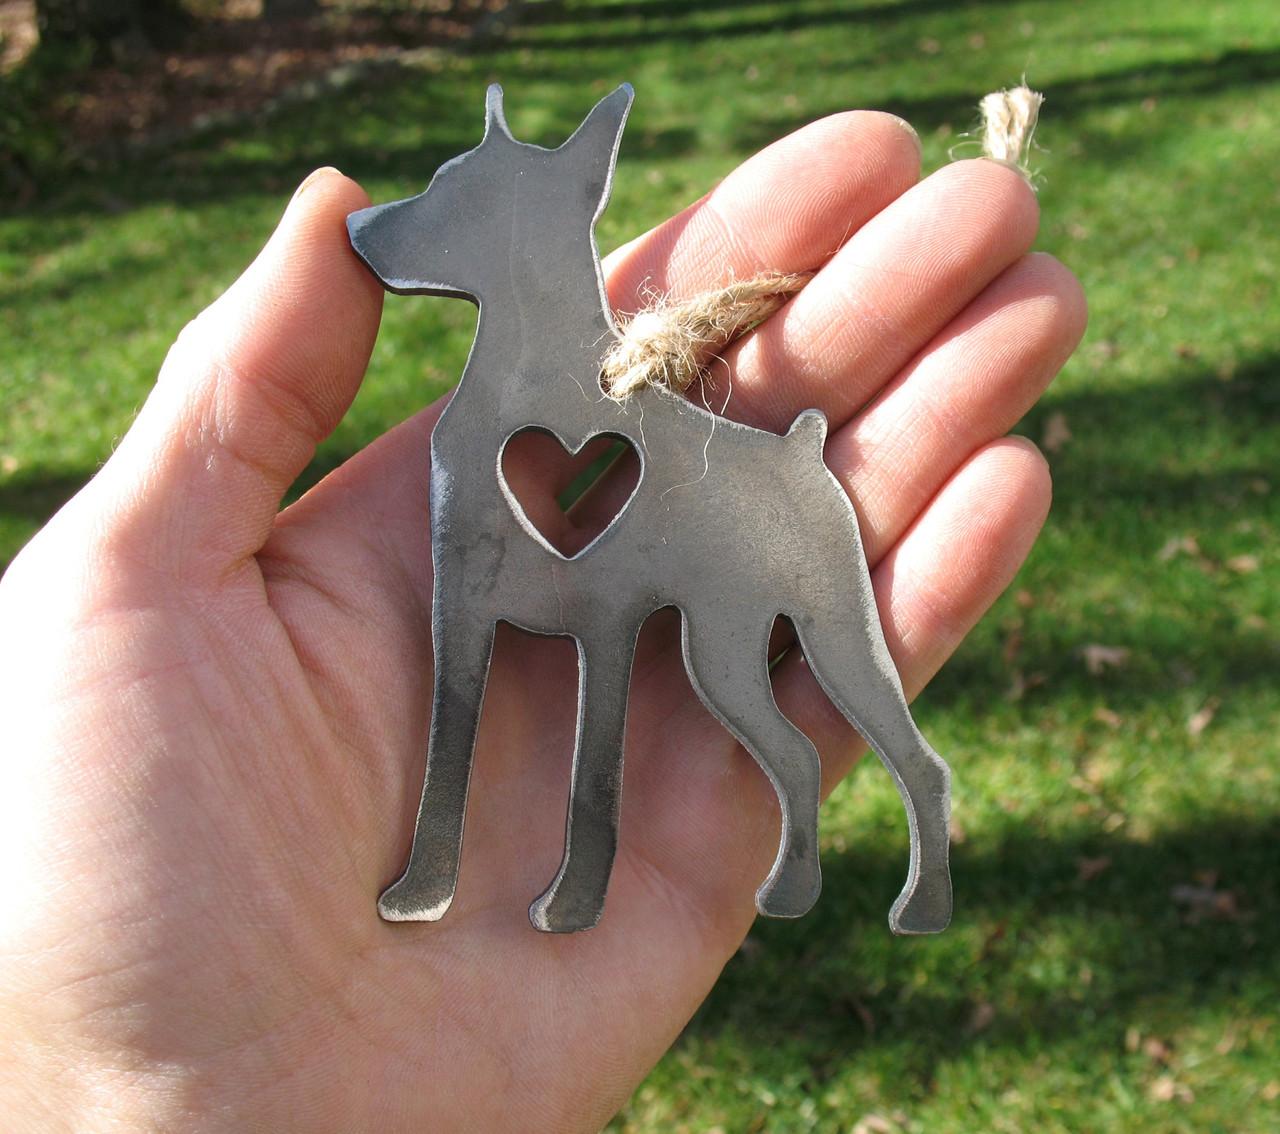 Newfoundland Dog Ornament 1 Pet Lover Memorial Ornament Pet Loss Dog Memorial Ornament Remembrance Gift Metal Dog Christmas Ornament